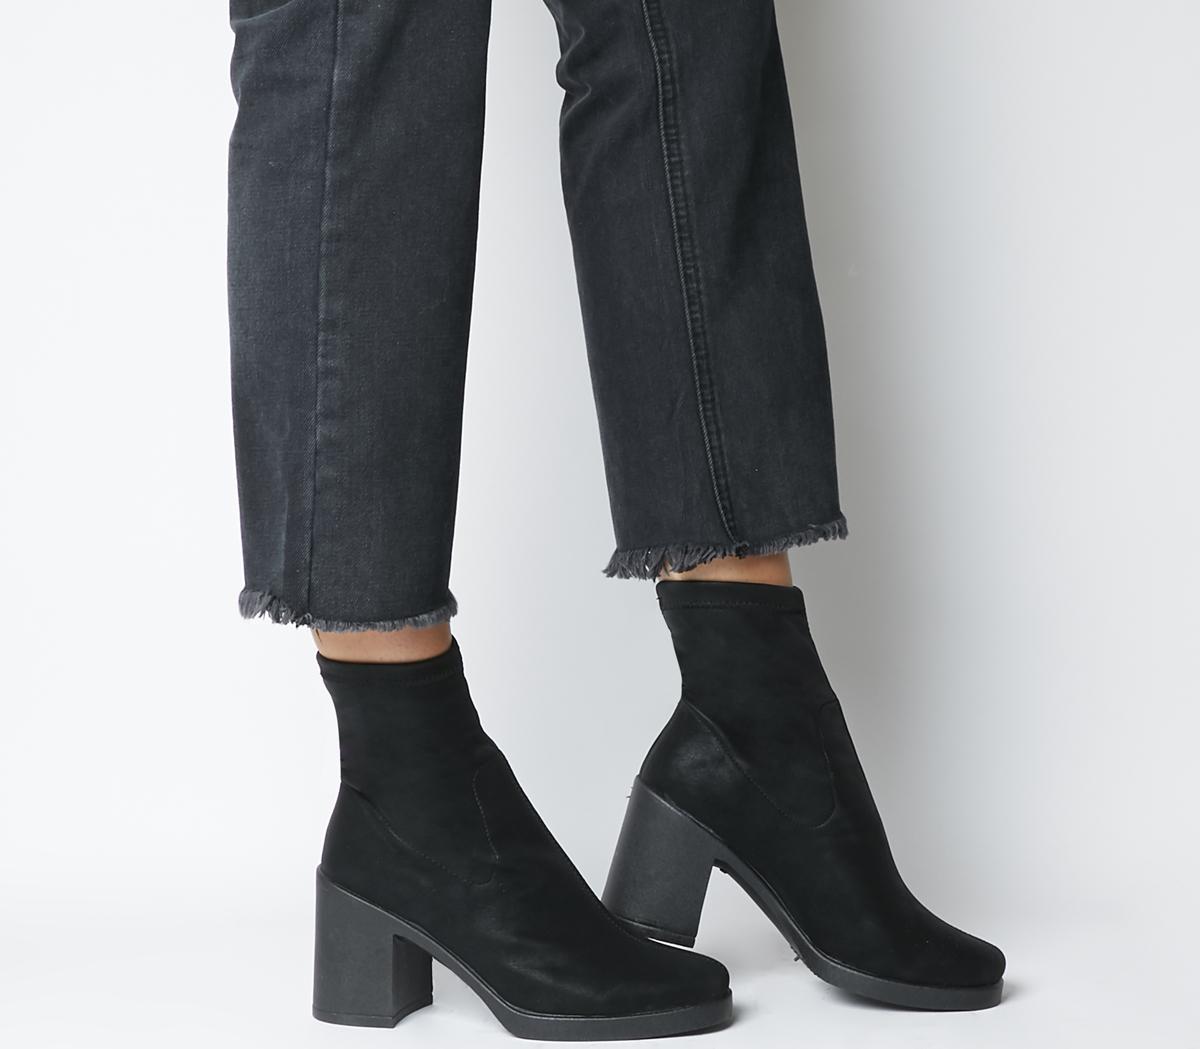 Artichoke Sock Boot Square Toe Boots